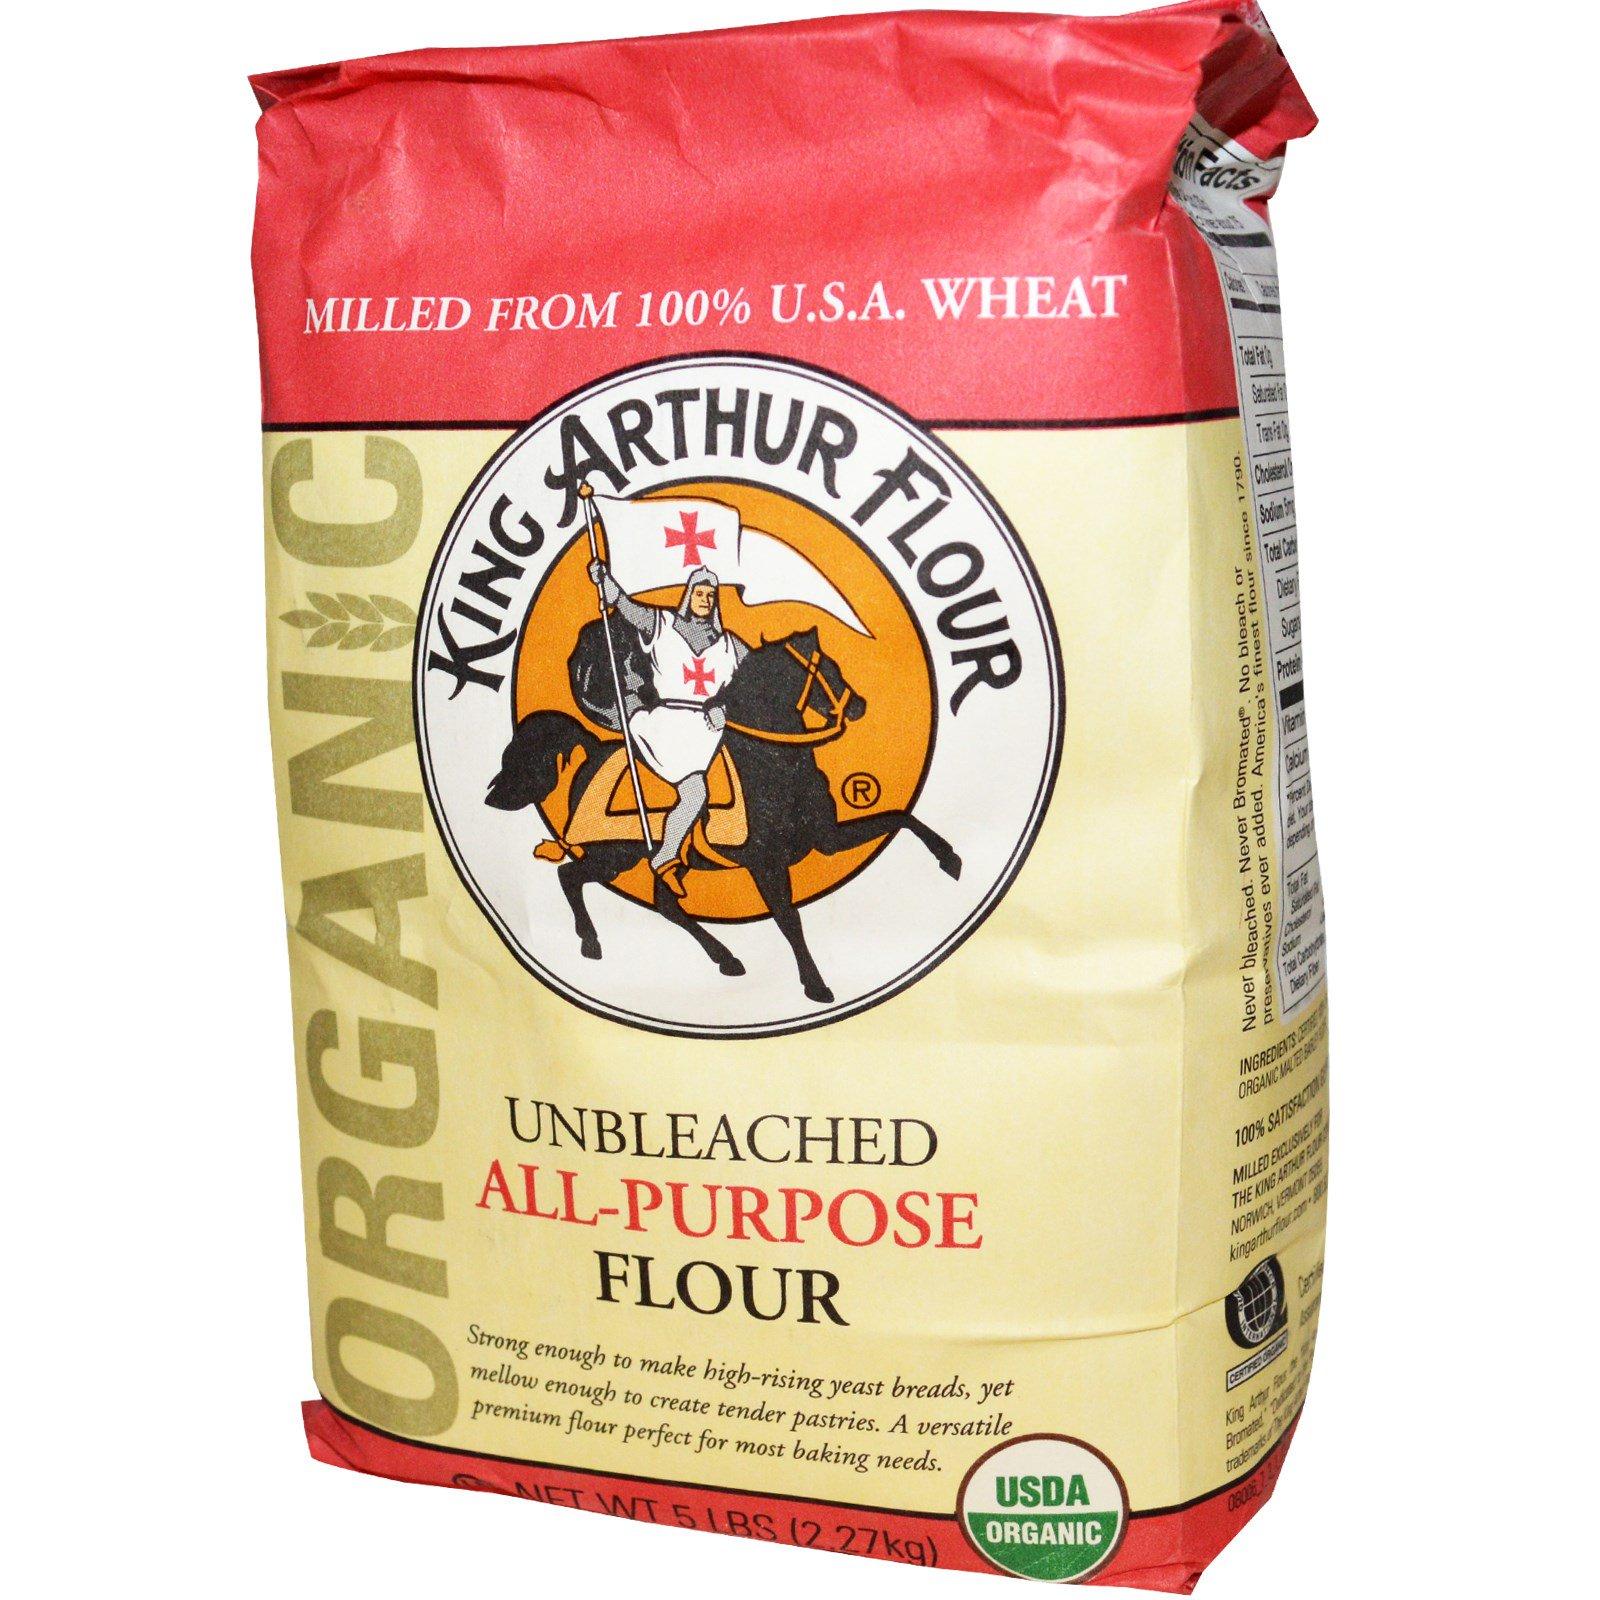 King Arthur Flour, All-Purpose Flour